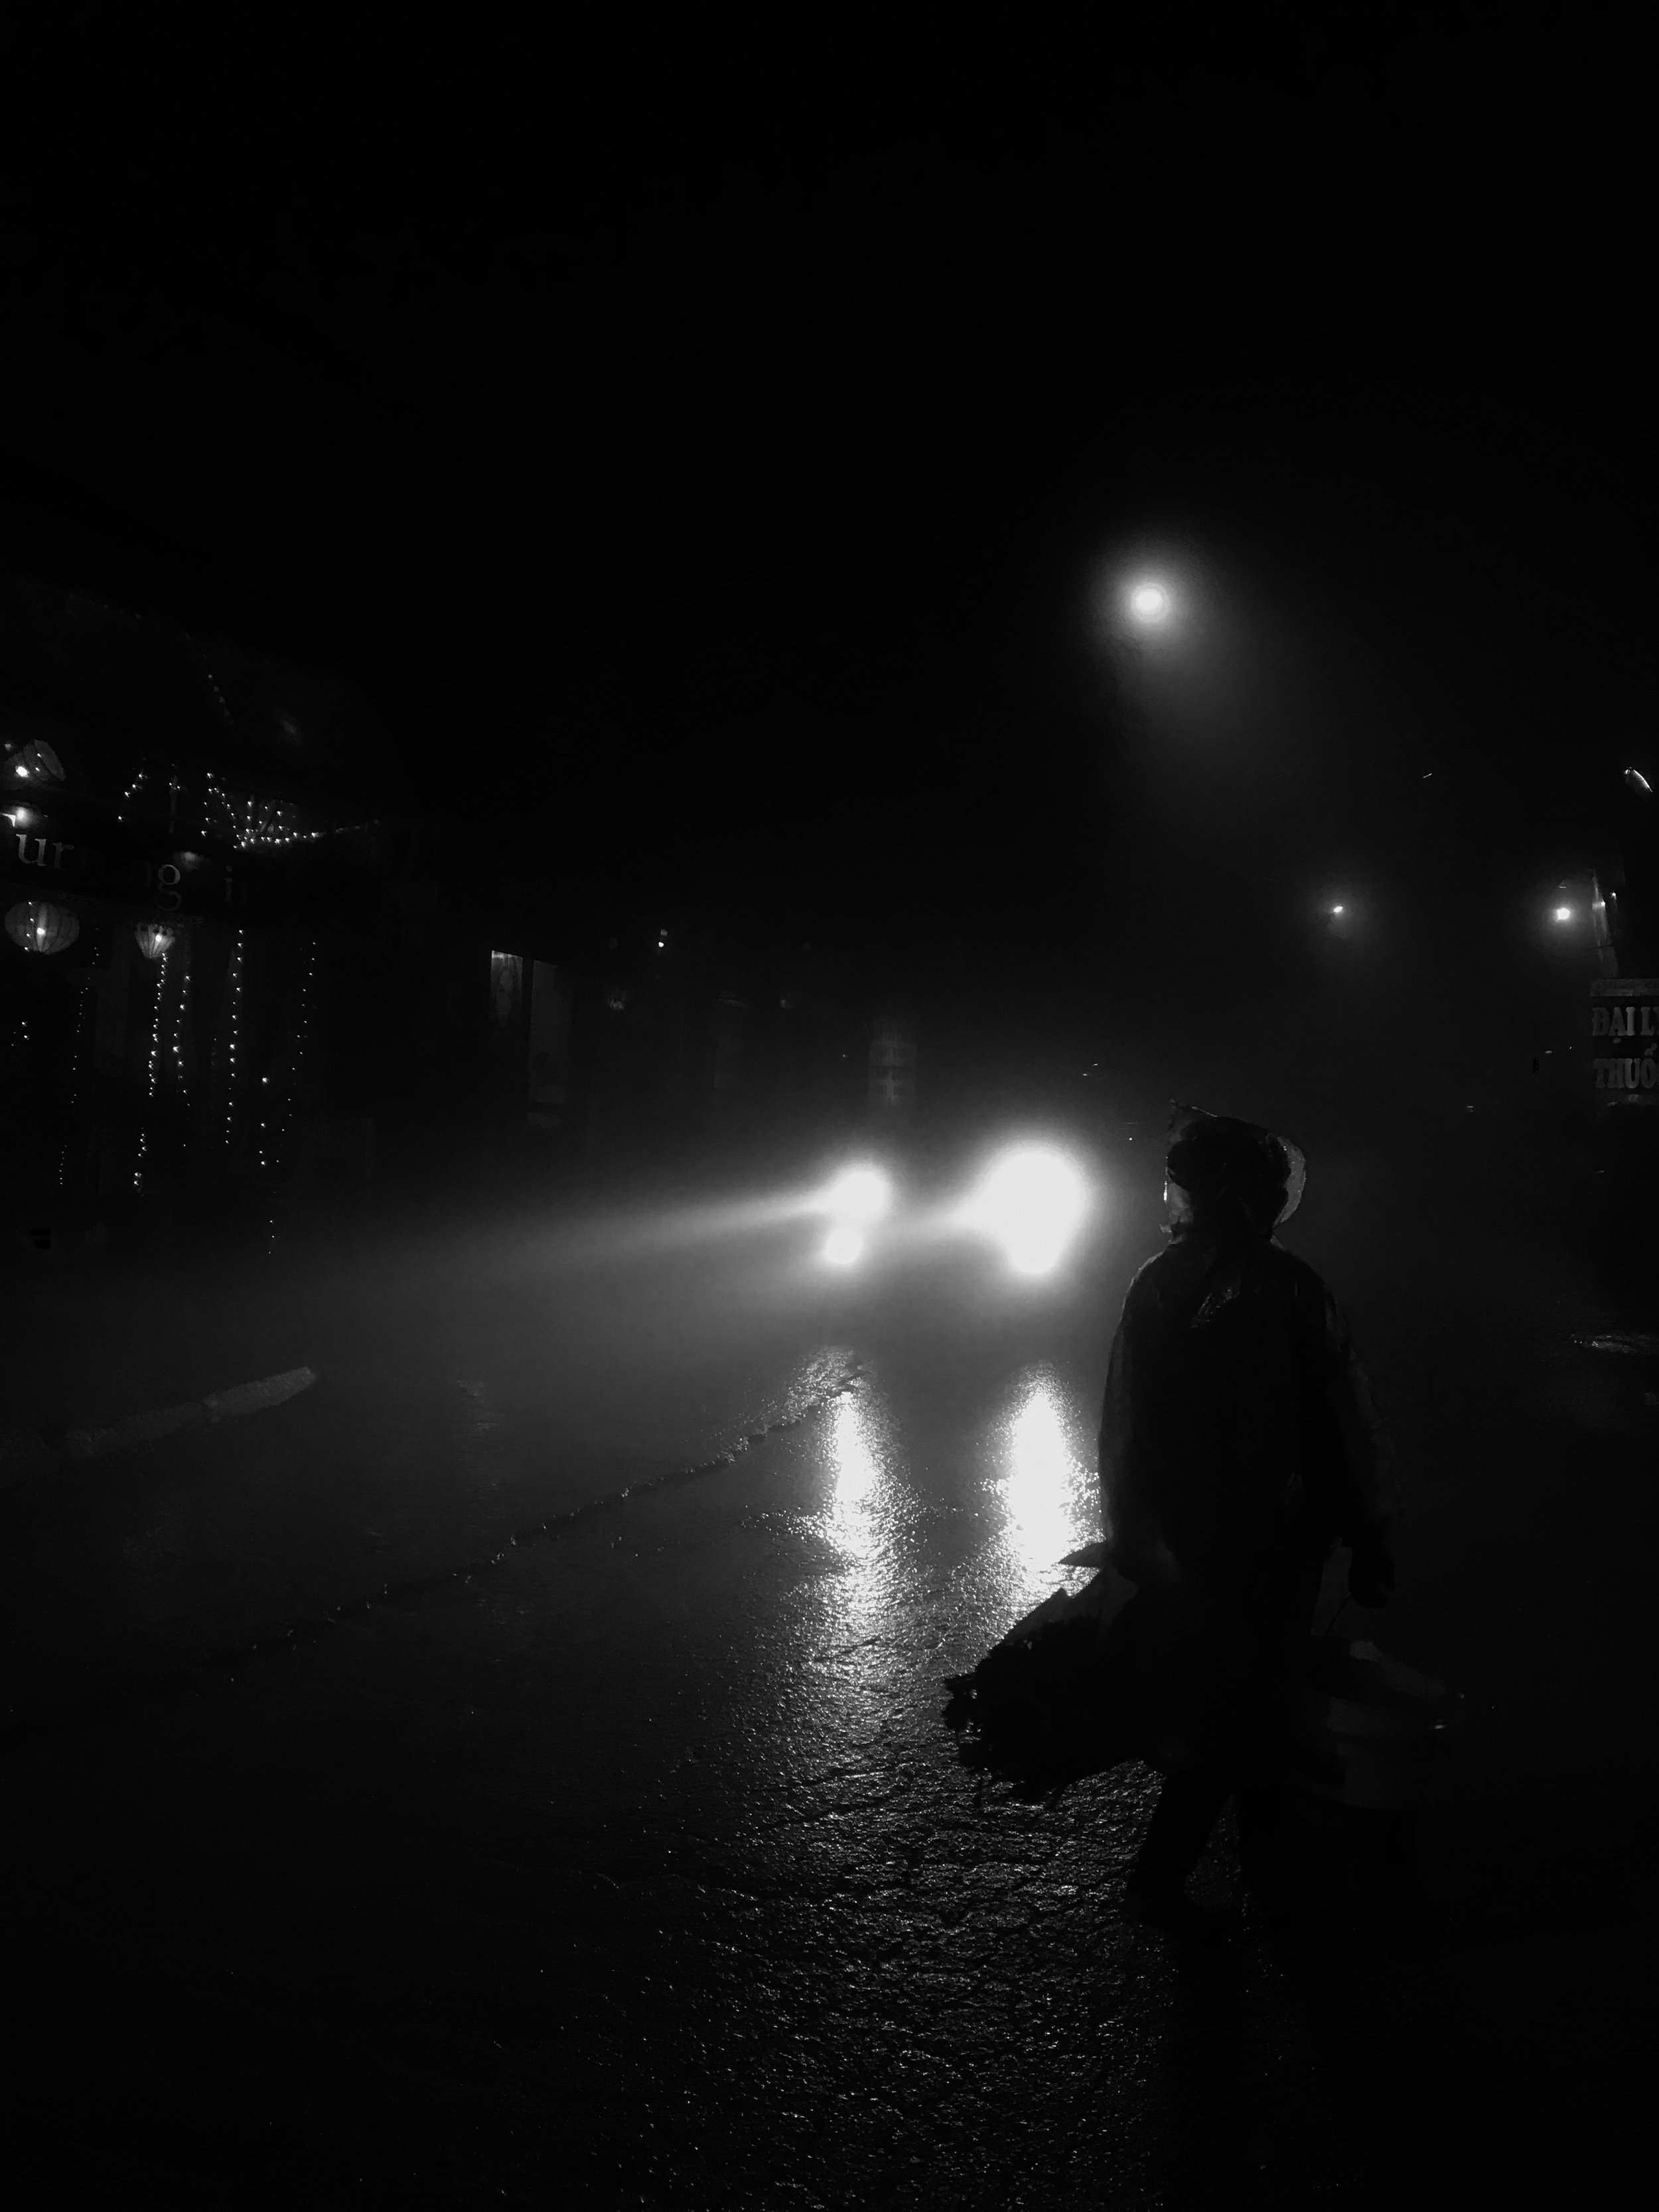 Copy of Headlights in the Rain